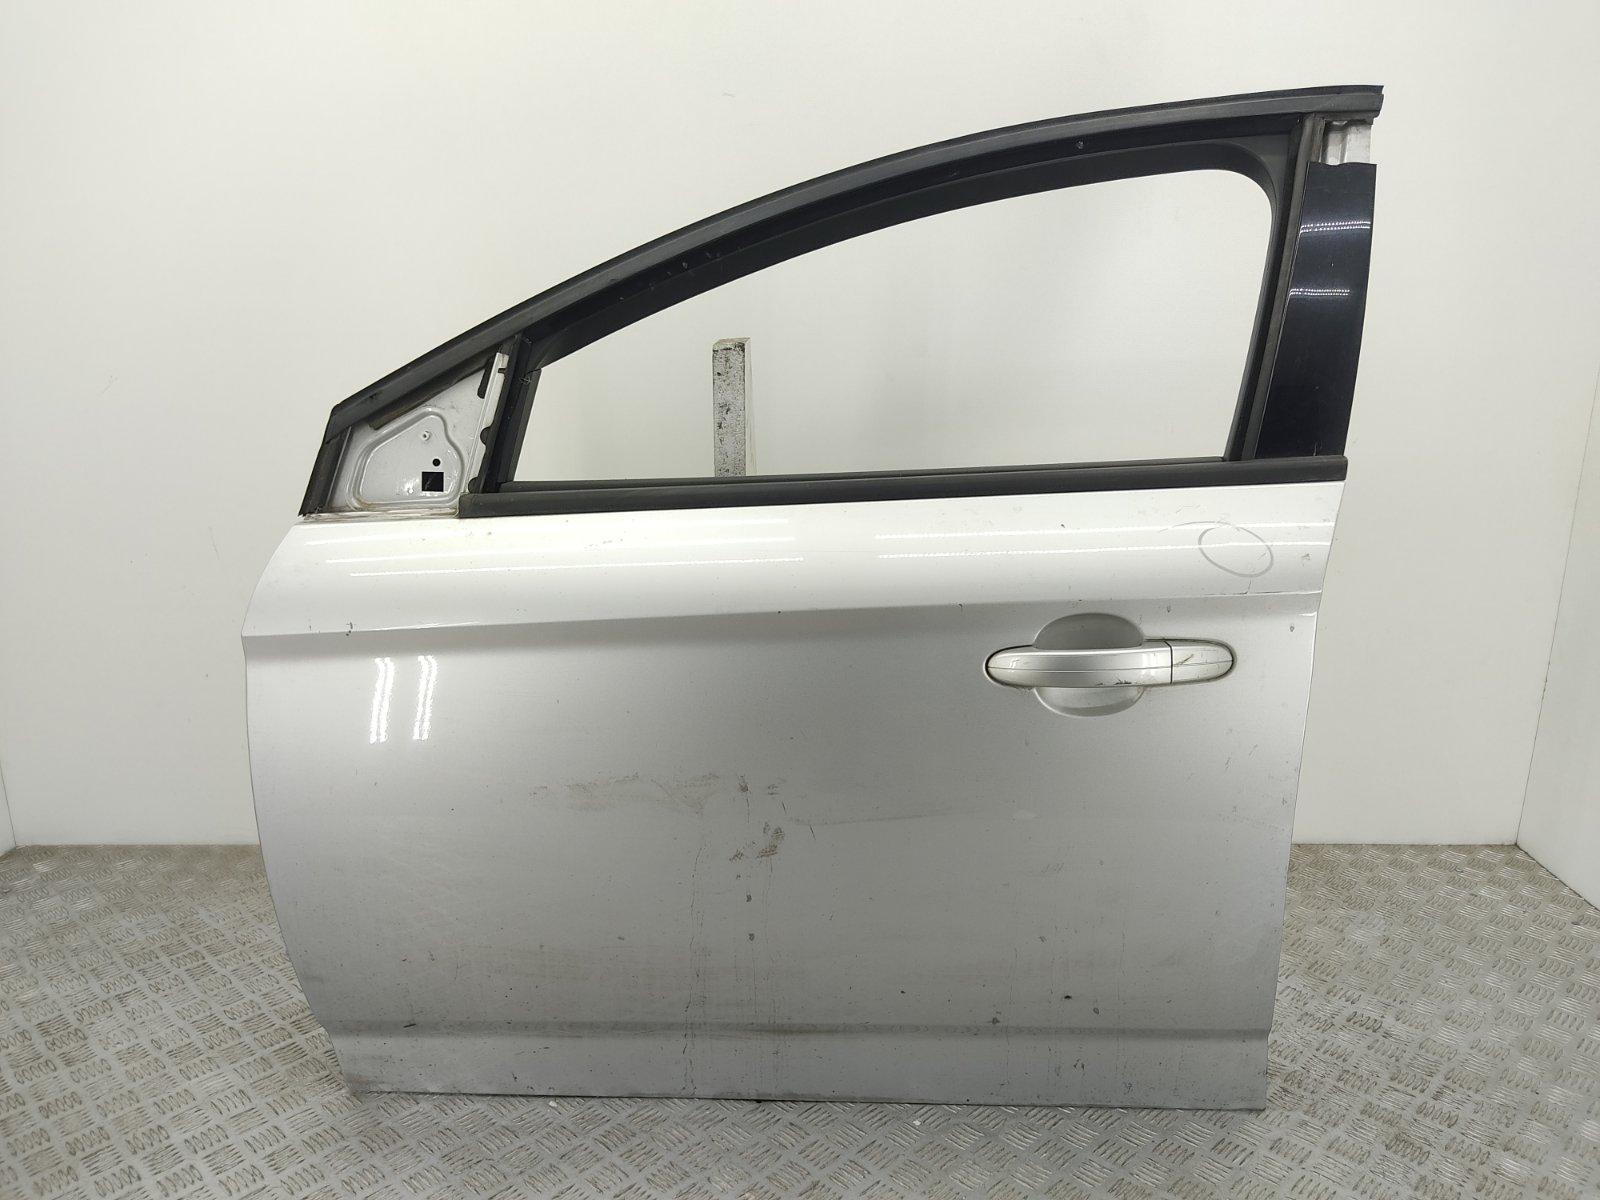 Дверь передняя левая Ford Mondeo 2.0 TDCI 2009 (б/у)